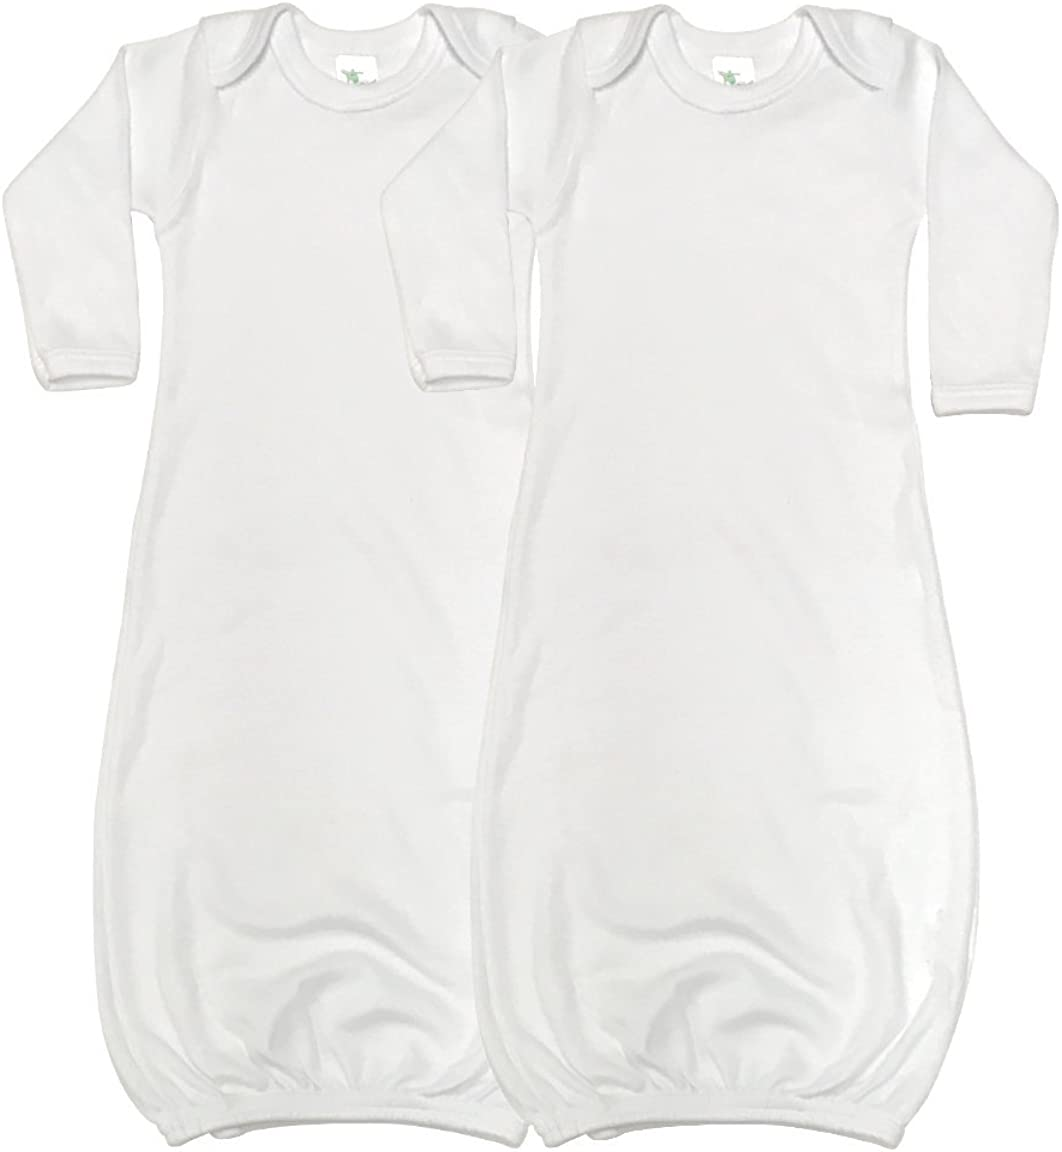 Laughing Giraffe Baby Long Sleeve Sleeper Gowns (Set of 2 -LG3800) White